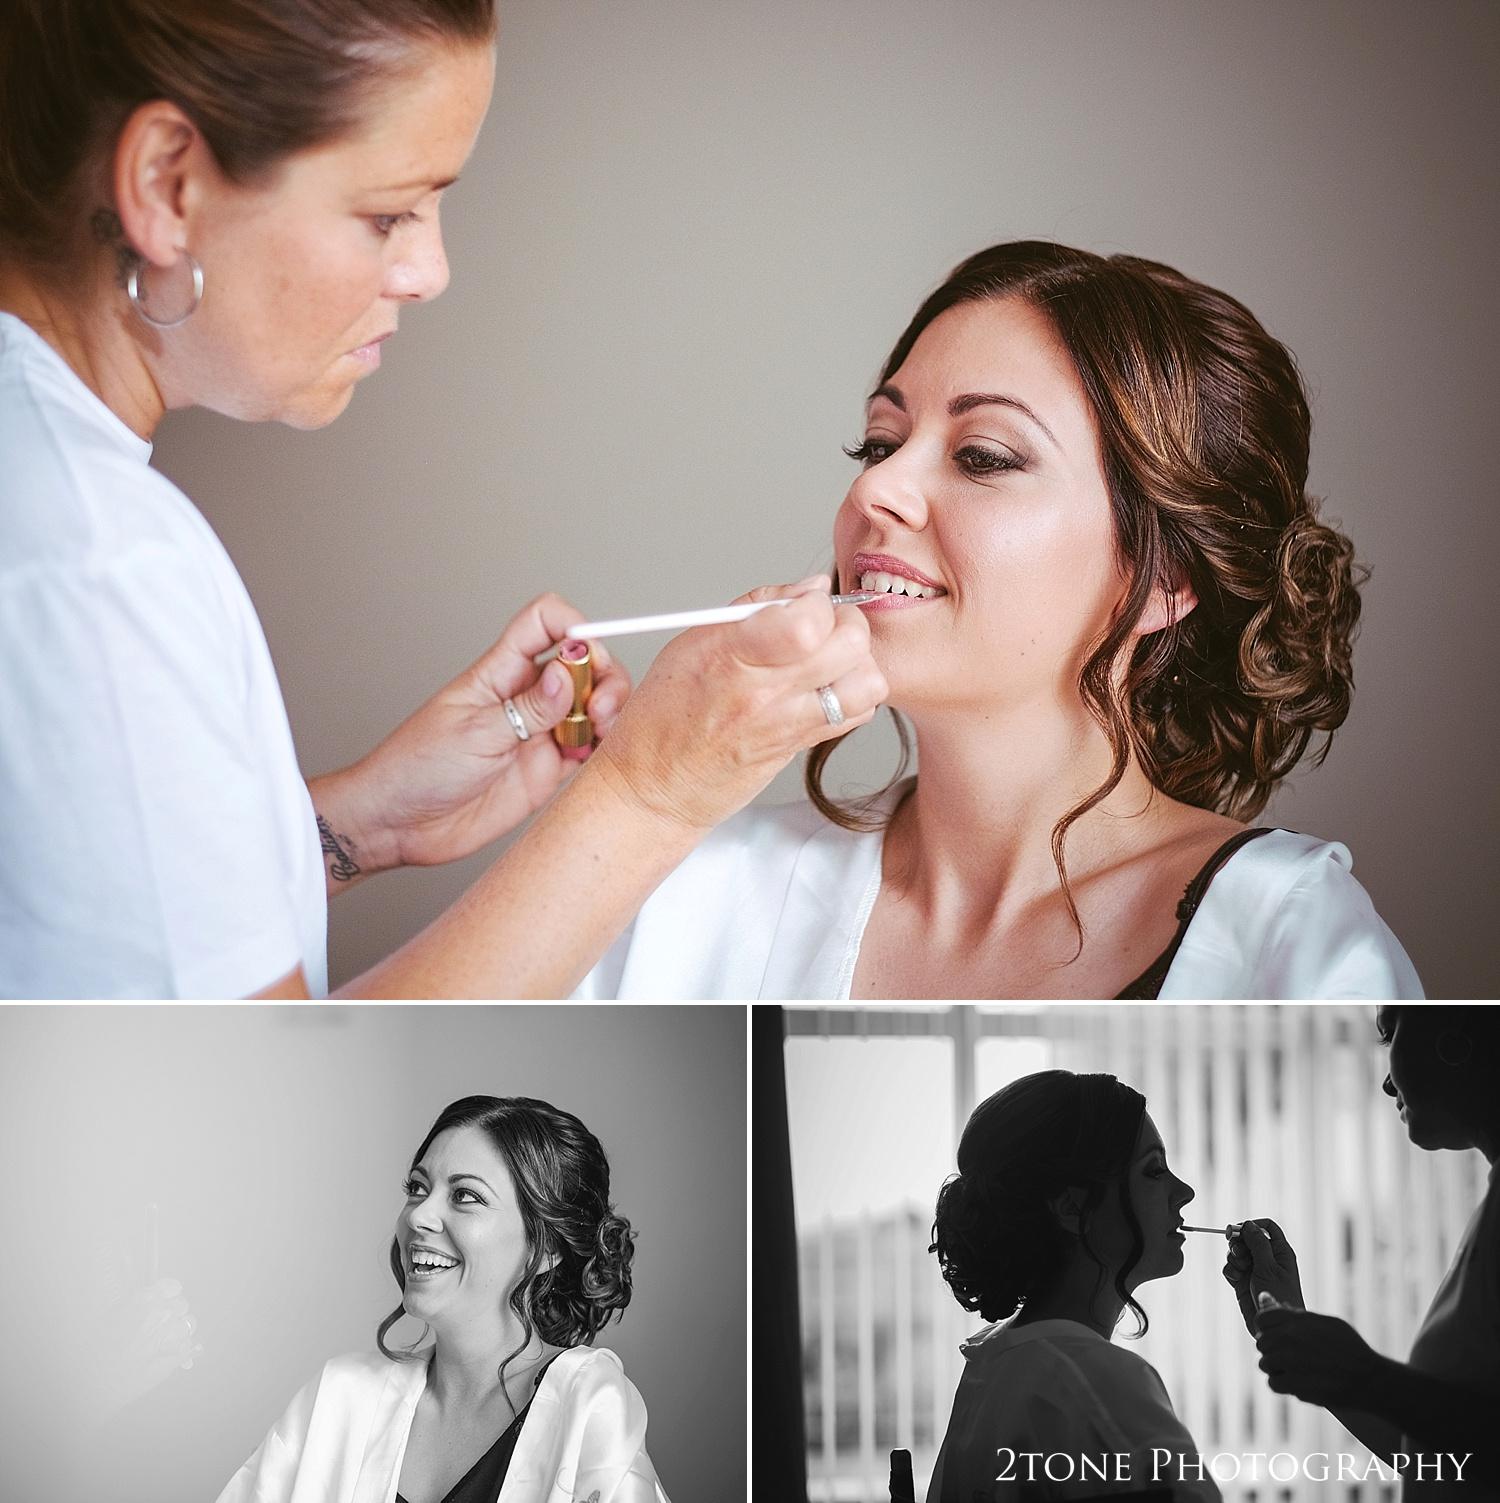 Wedding make up by wedding photographers in Durham, www.2tonephotography.co.uk